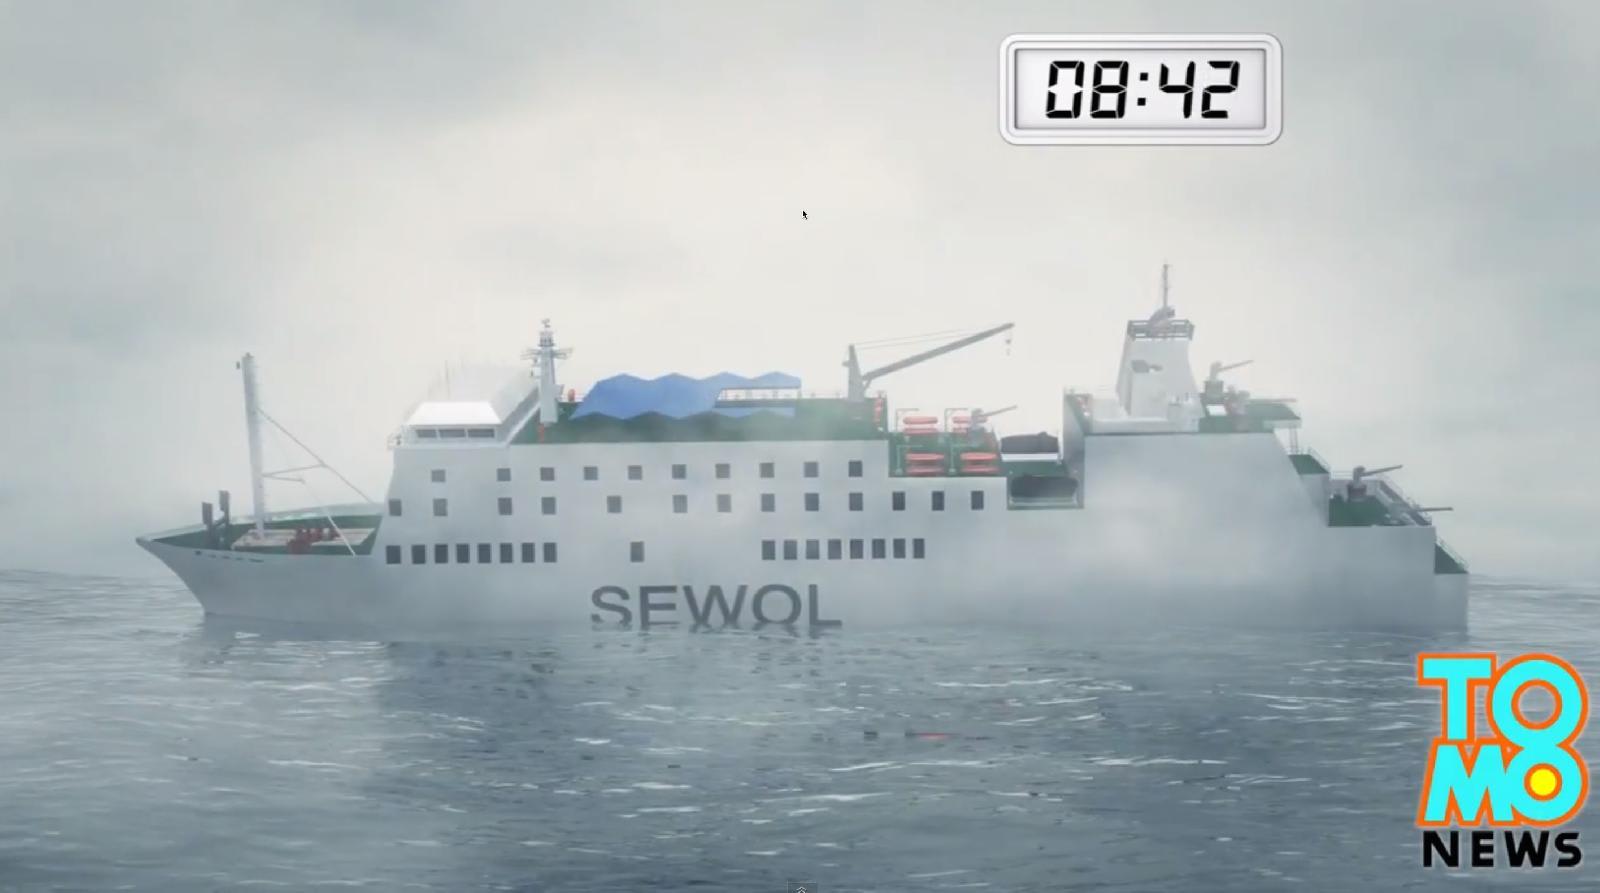 Sewol号の沈没状況解説 Â�ニメ動画 Memories On The Sea Ƶ�の記録